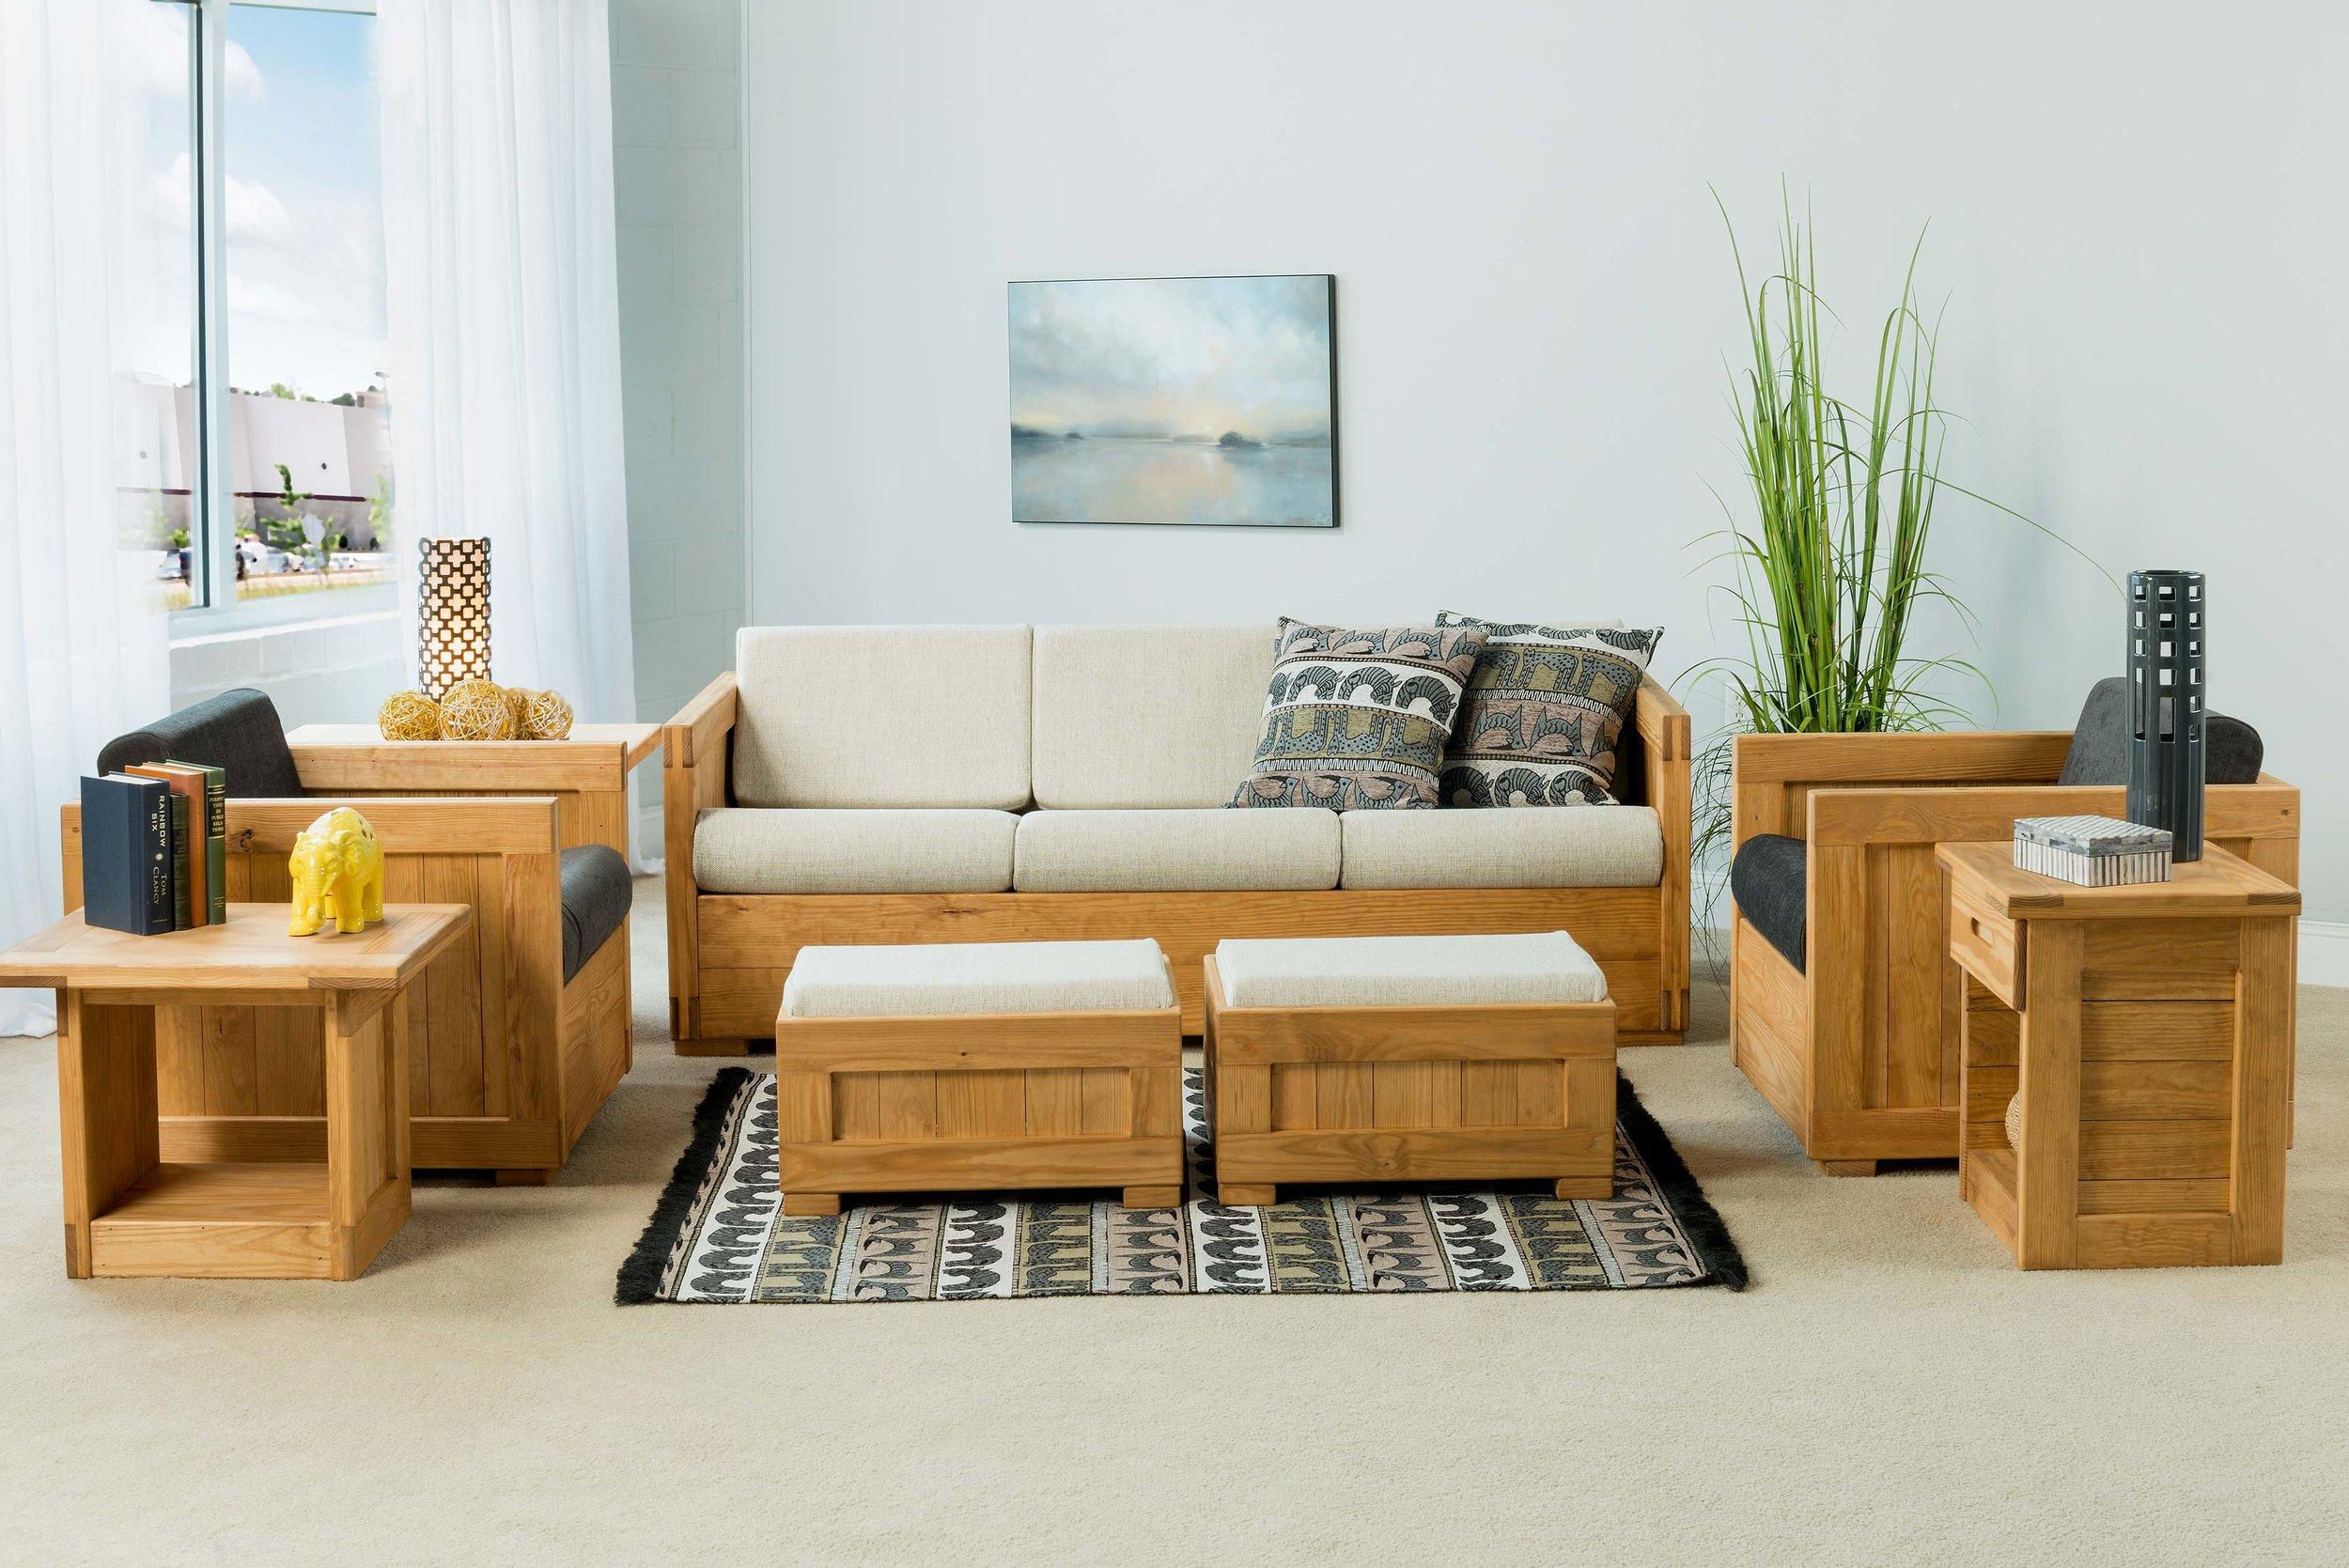 CLassic Line Furniture in Honey pine